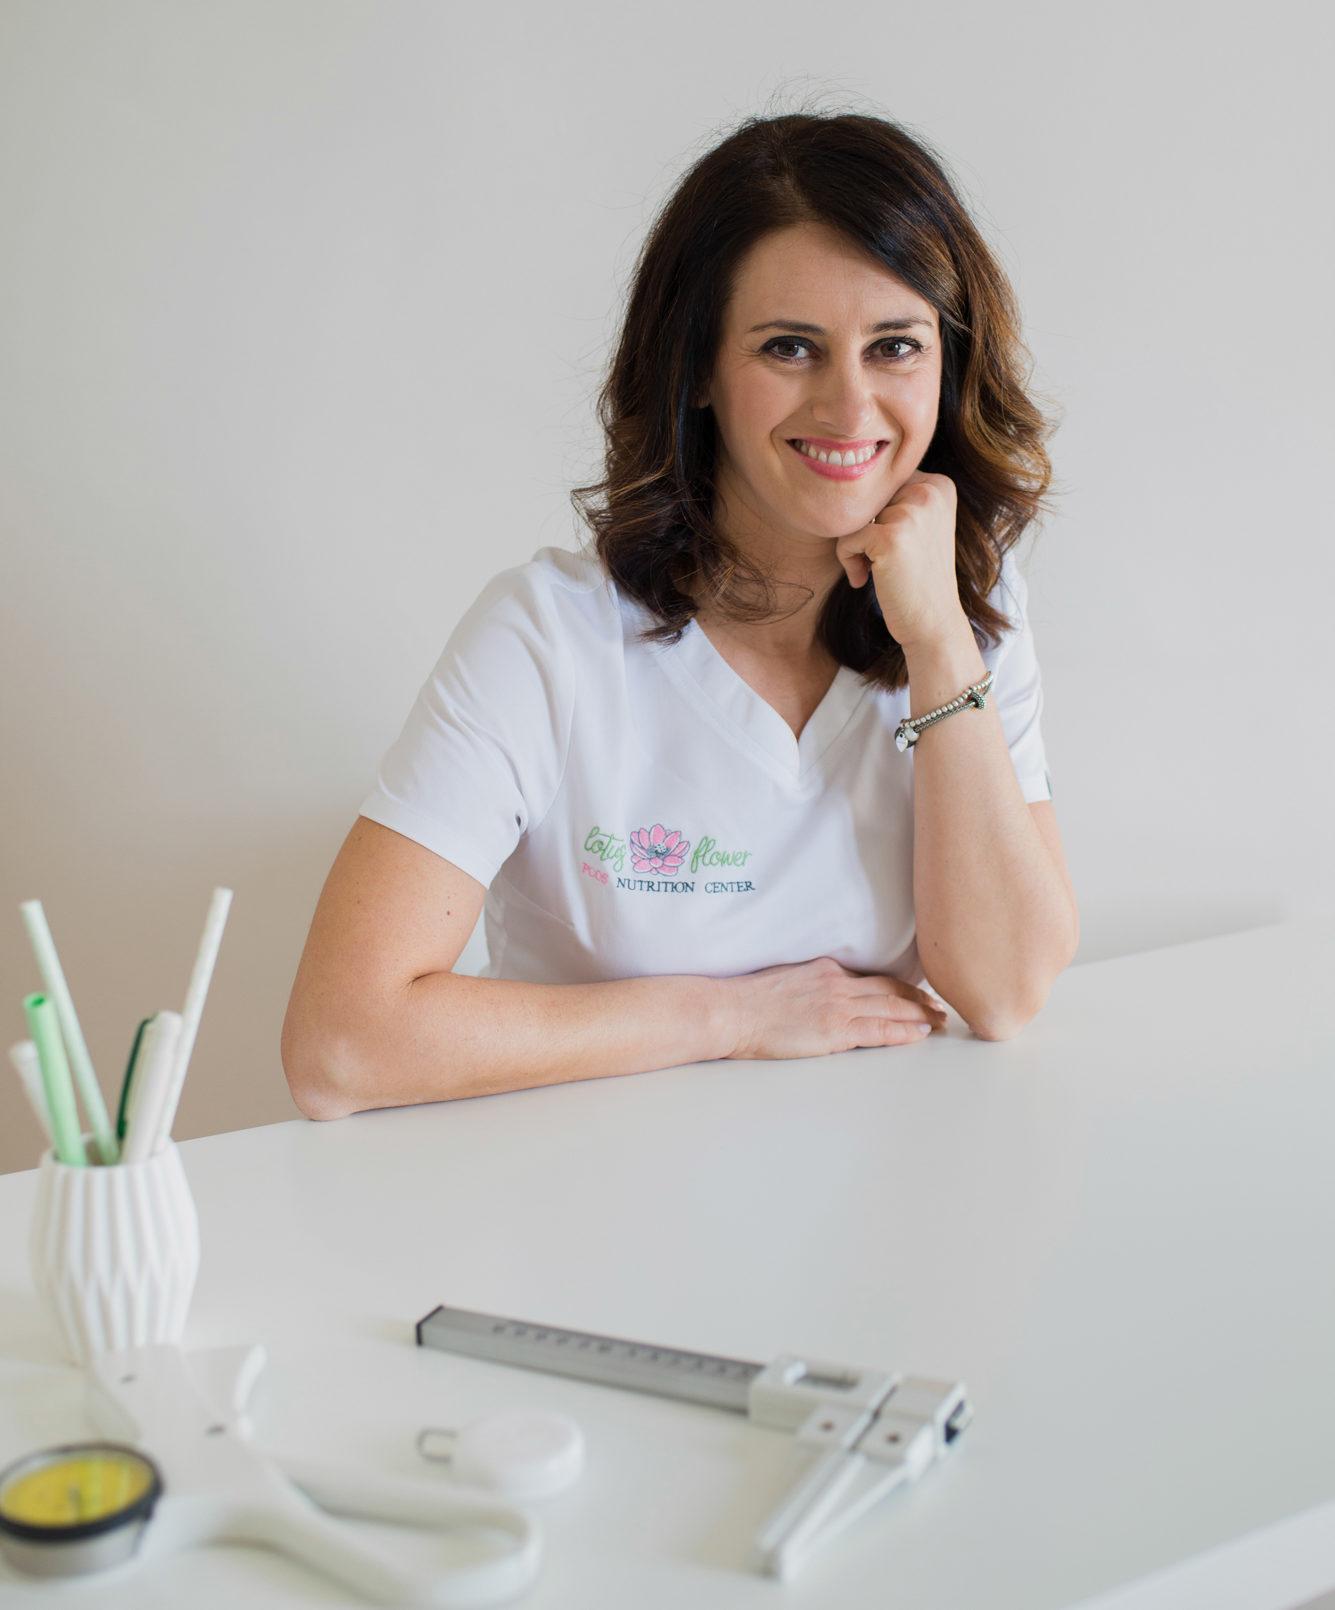 Dott.ssa Stefania Cattaneo - Biologa nutrizionista